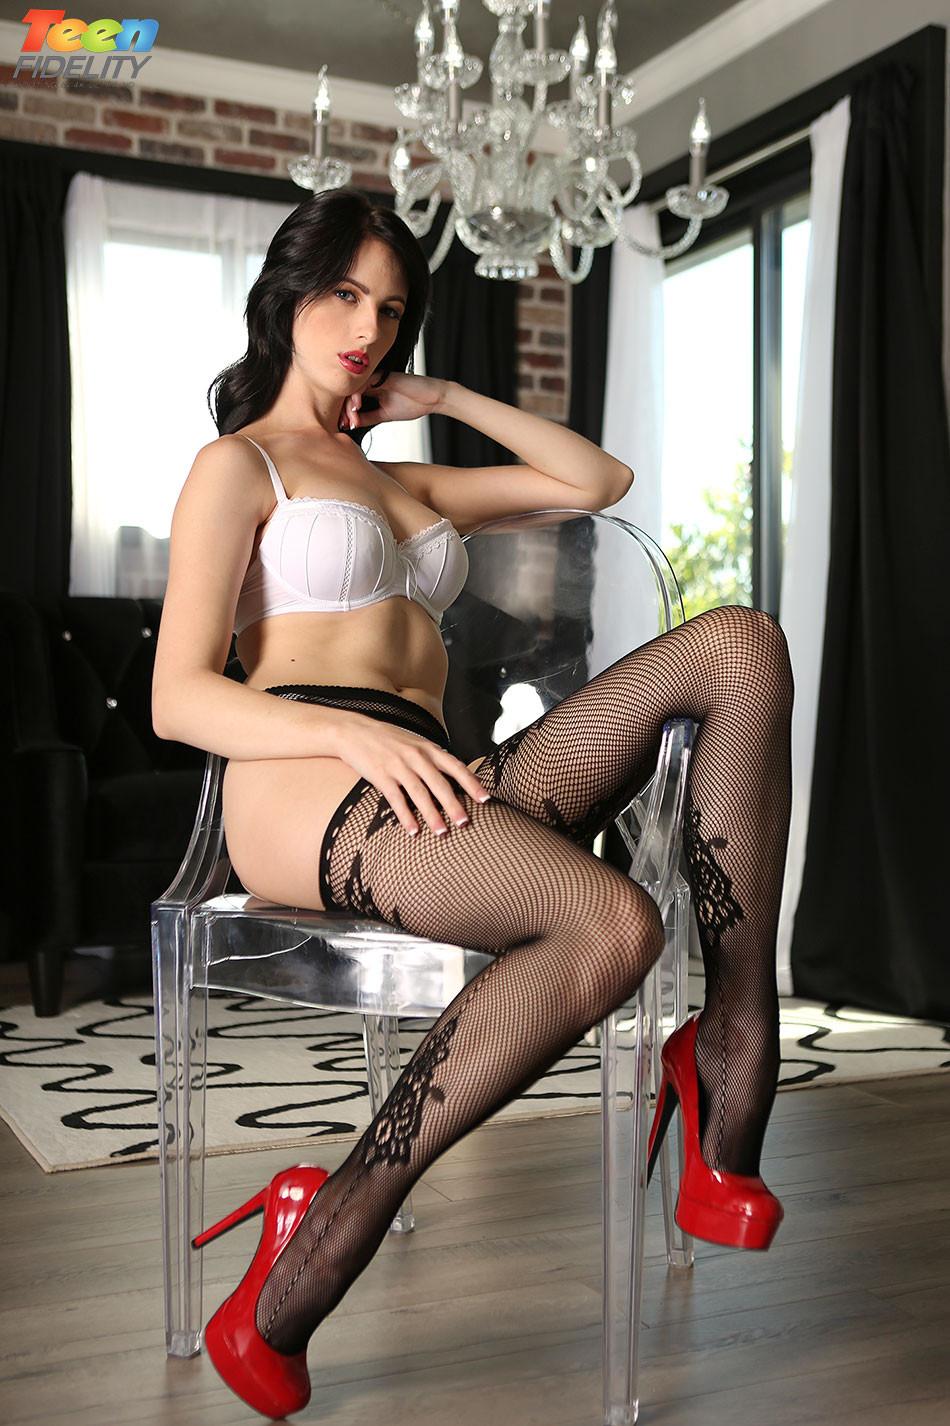 Alex Harper Porn Twitter alex harper in black stockings - pichunter